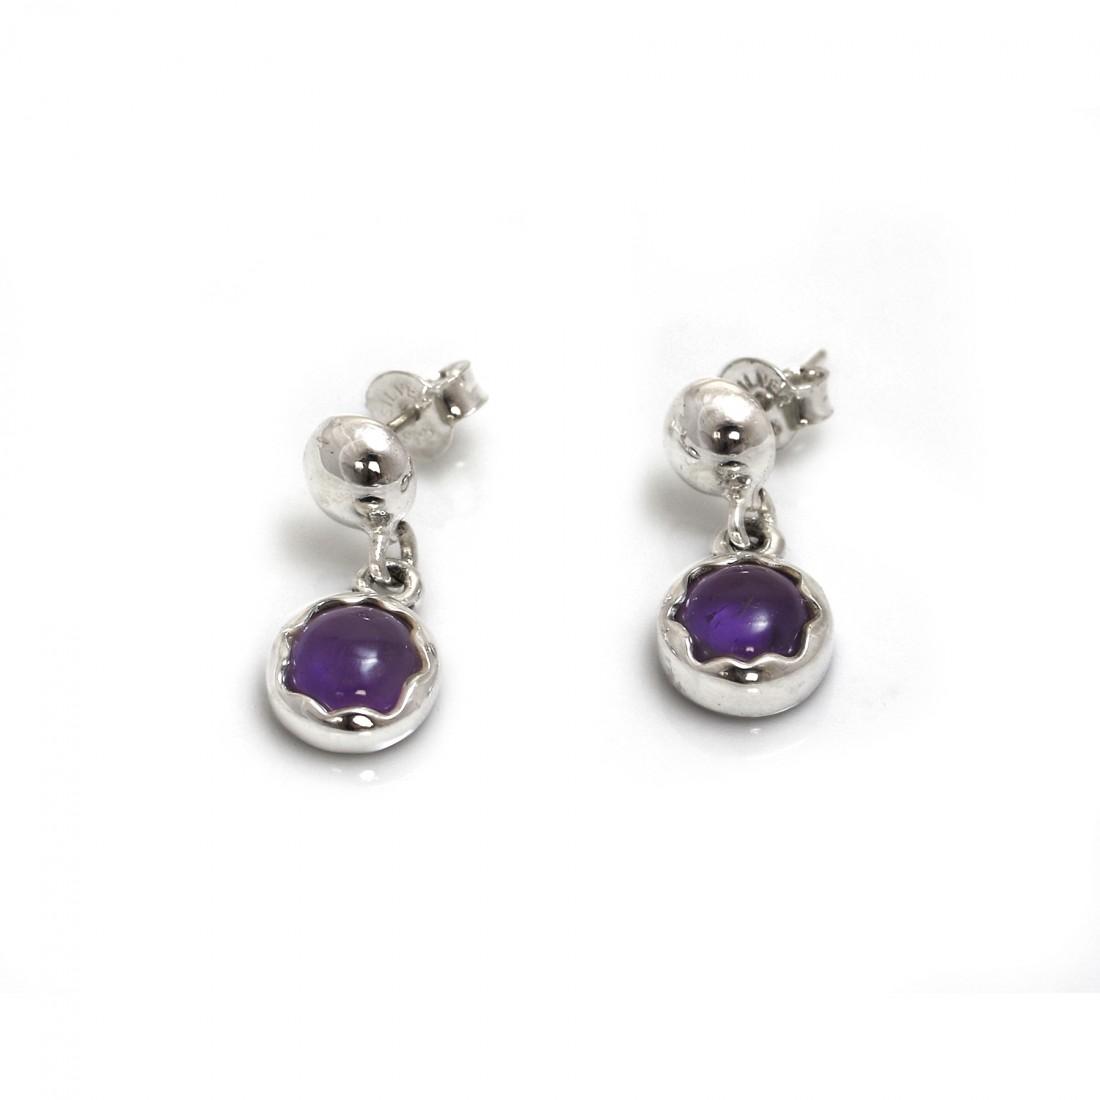 February Birthstone - Sterling Silver & Amethyst Dangly Earrings